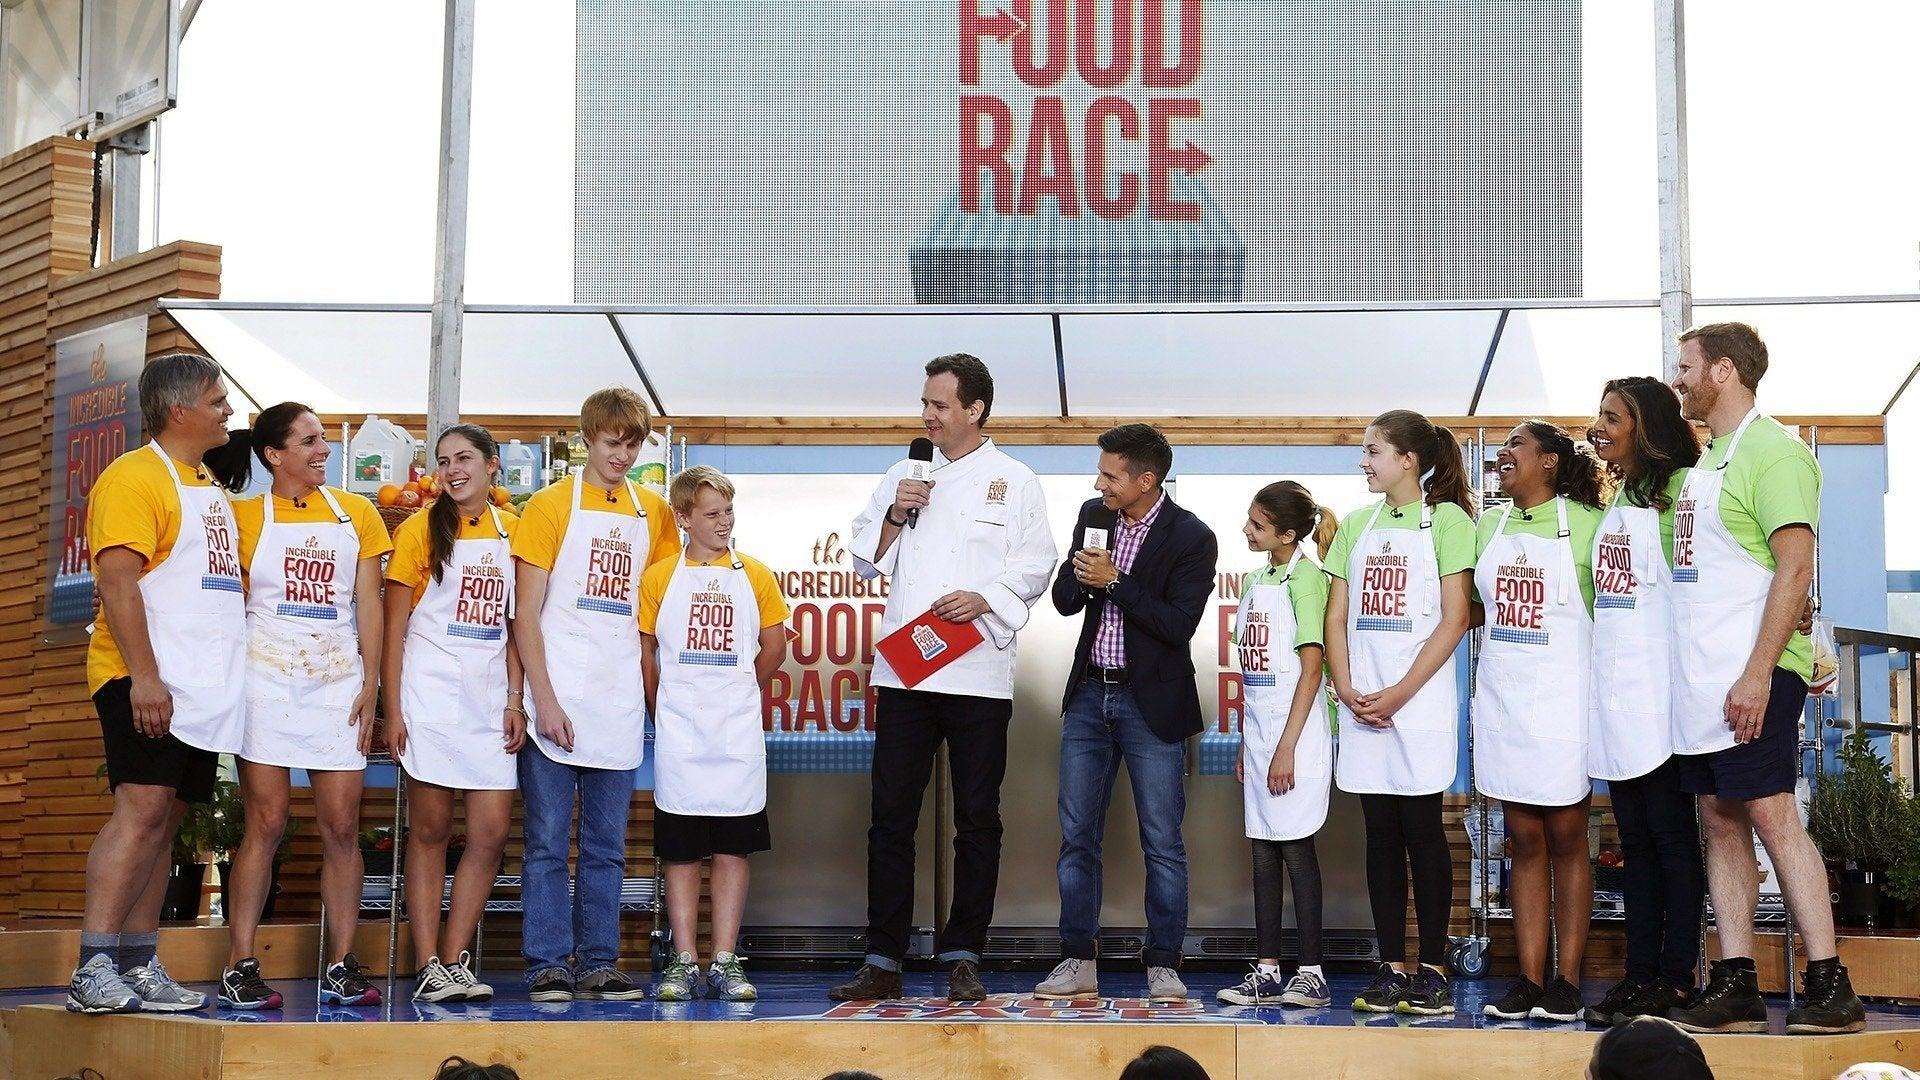 The Incredible Food Race